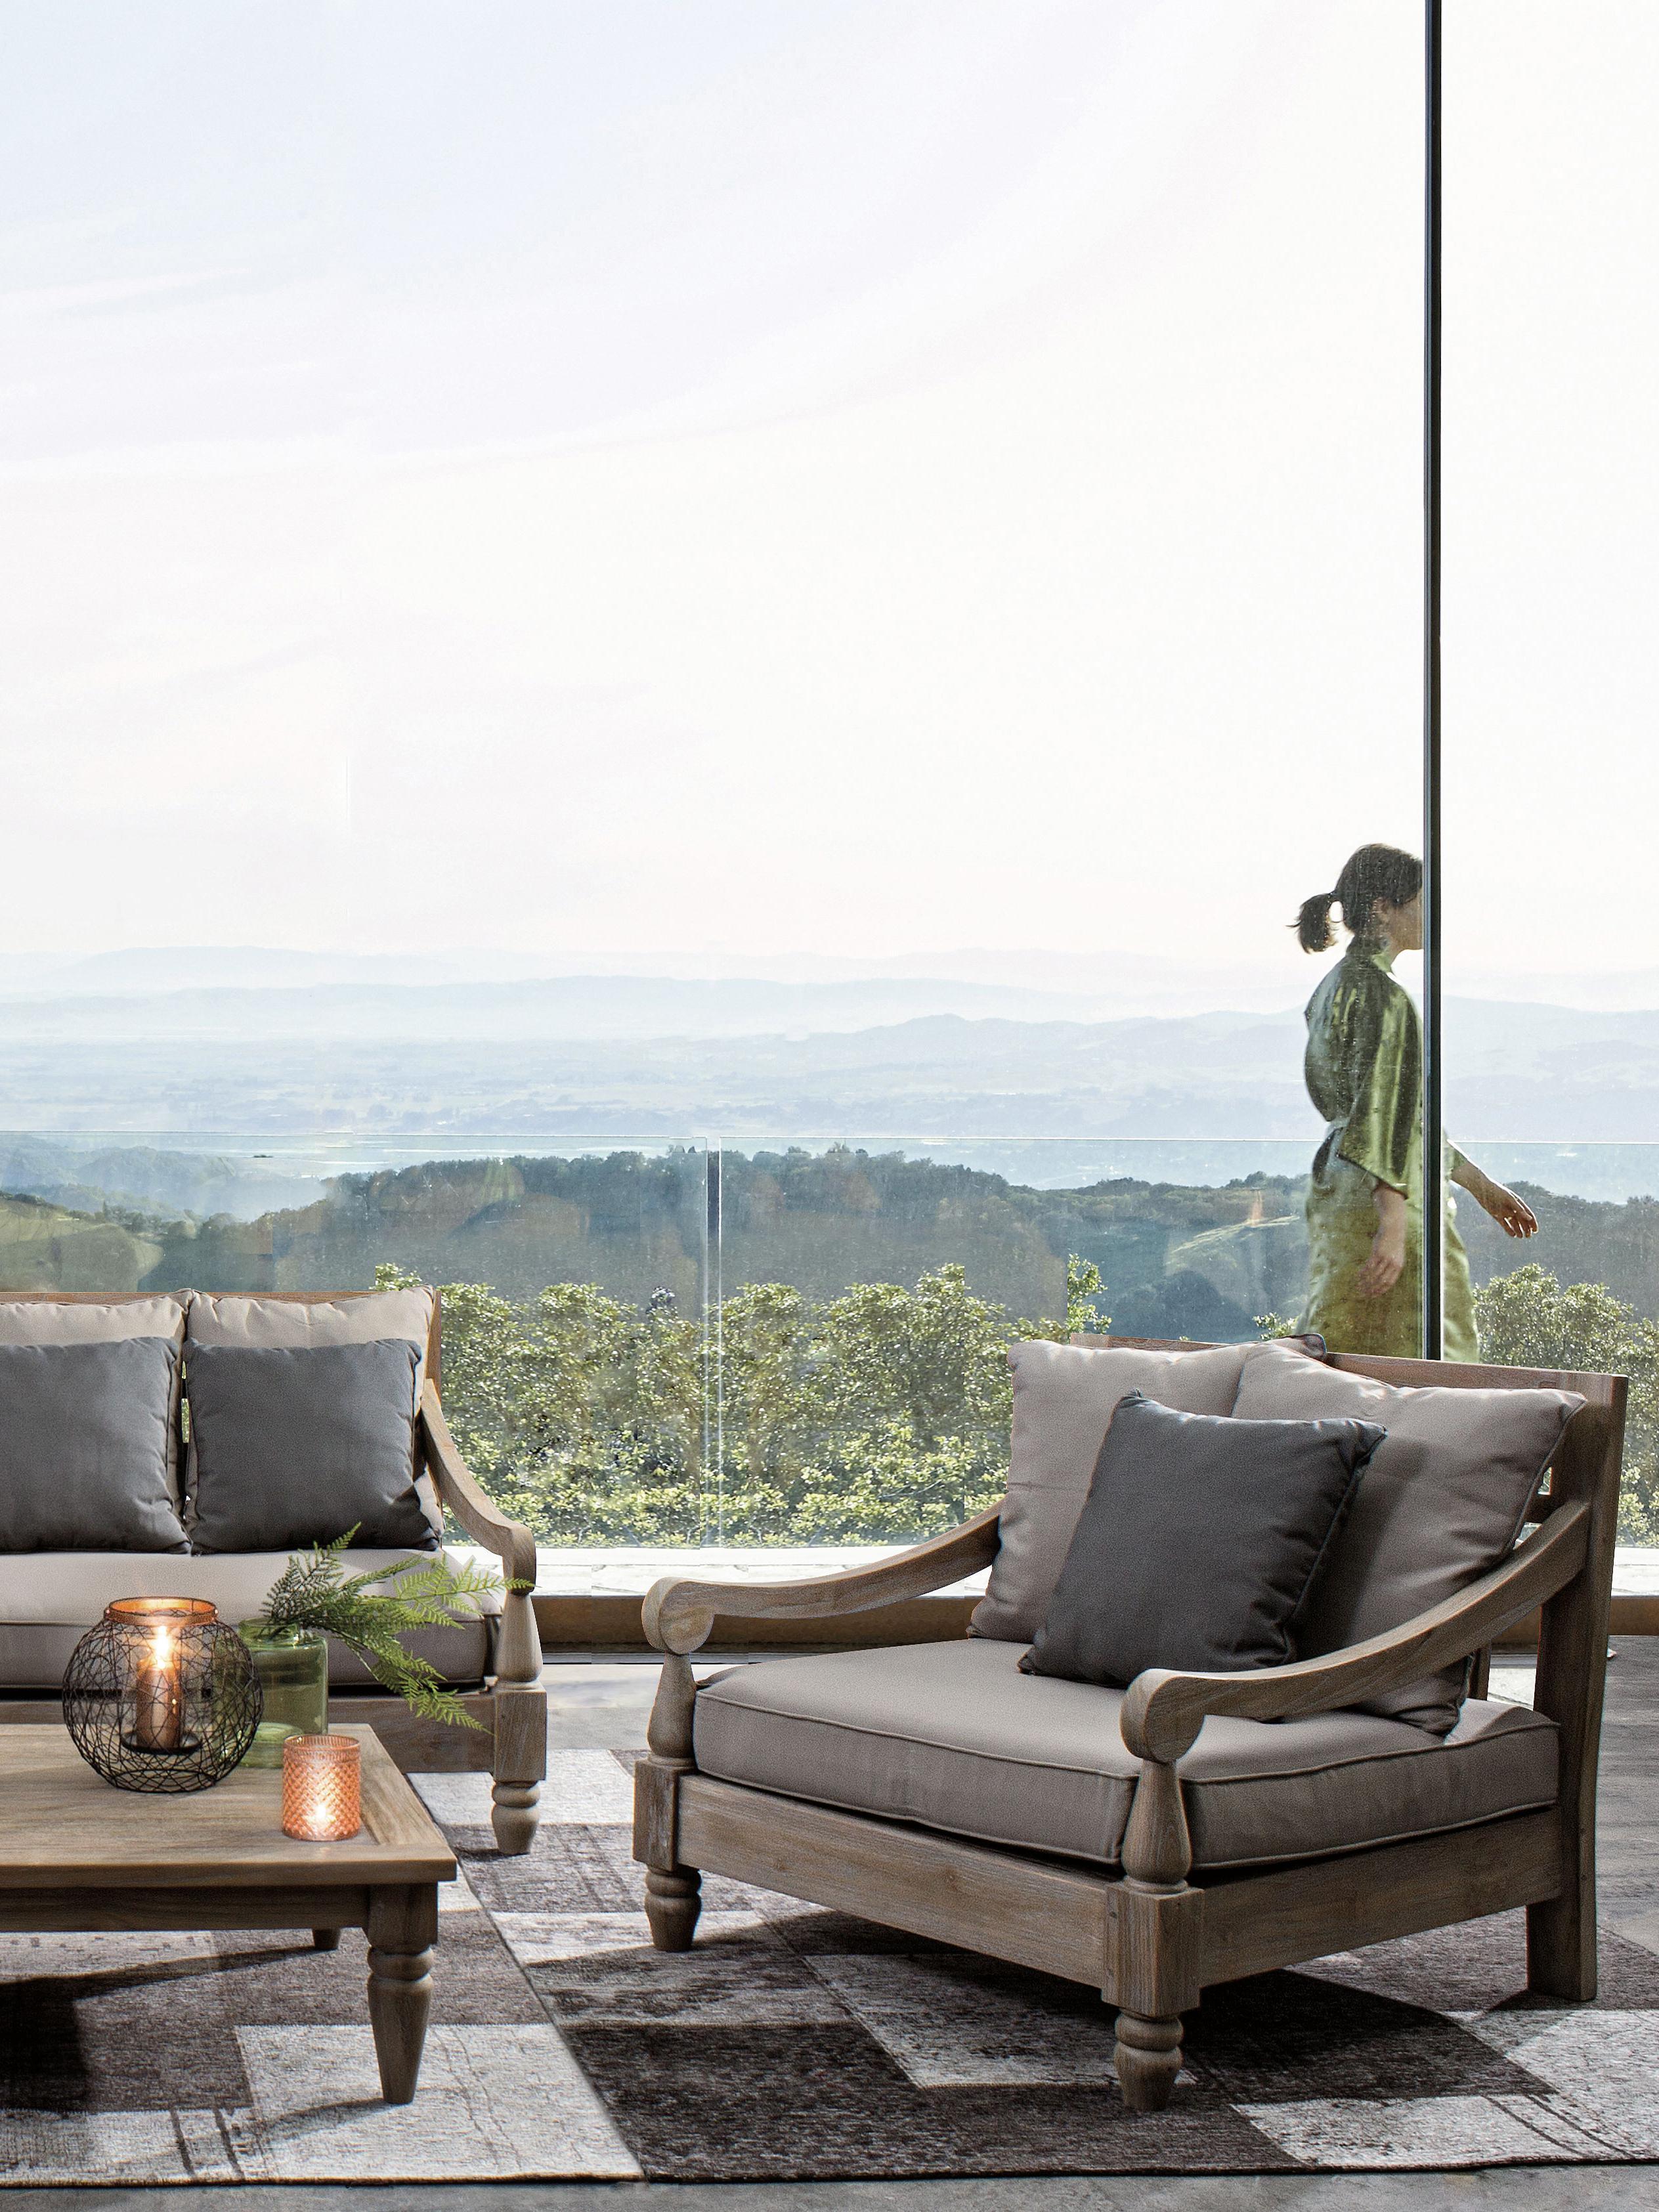 Garten-Loungesessel Bali aus Teakholz, Rahmen: Teakholz, Rot, B 90 x T 90 cm